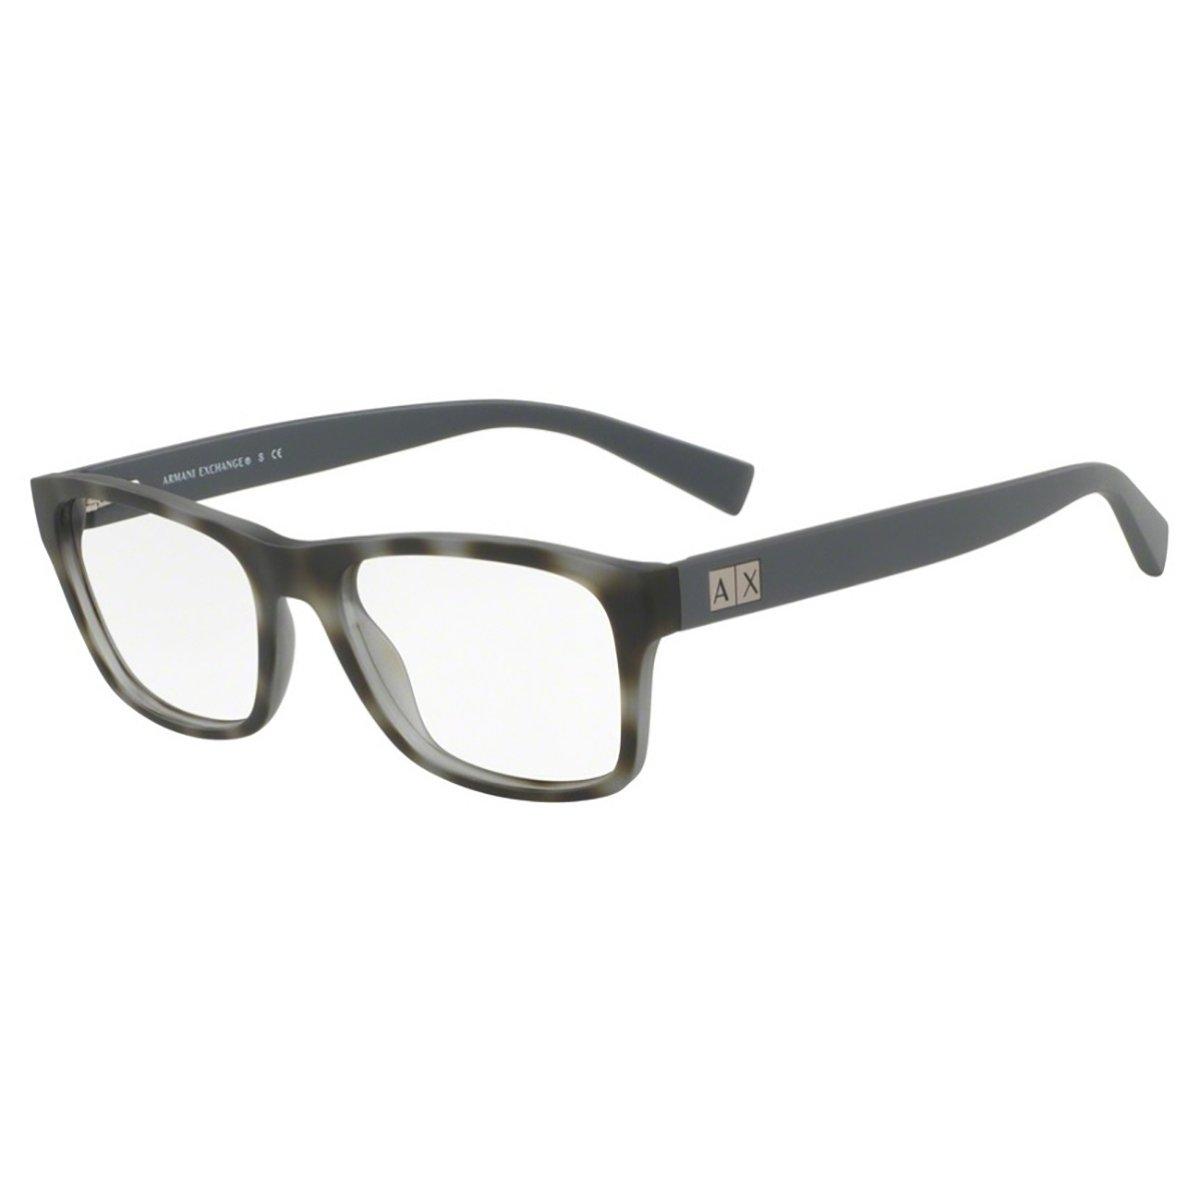 33965f83f Compre Óculos de Grau Armani Exchange em 10X   Tri-Jóia Shop